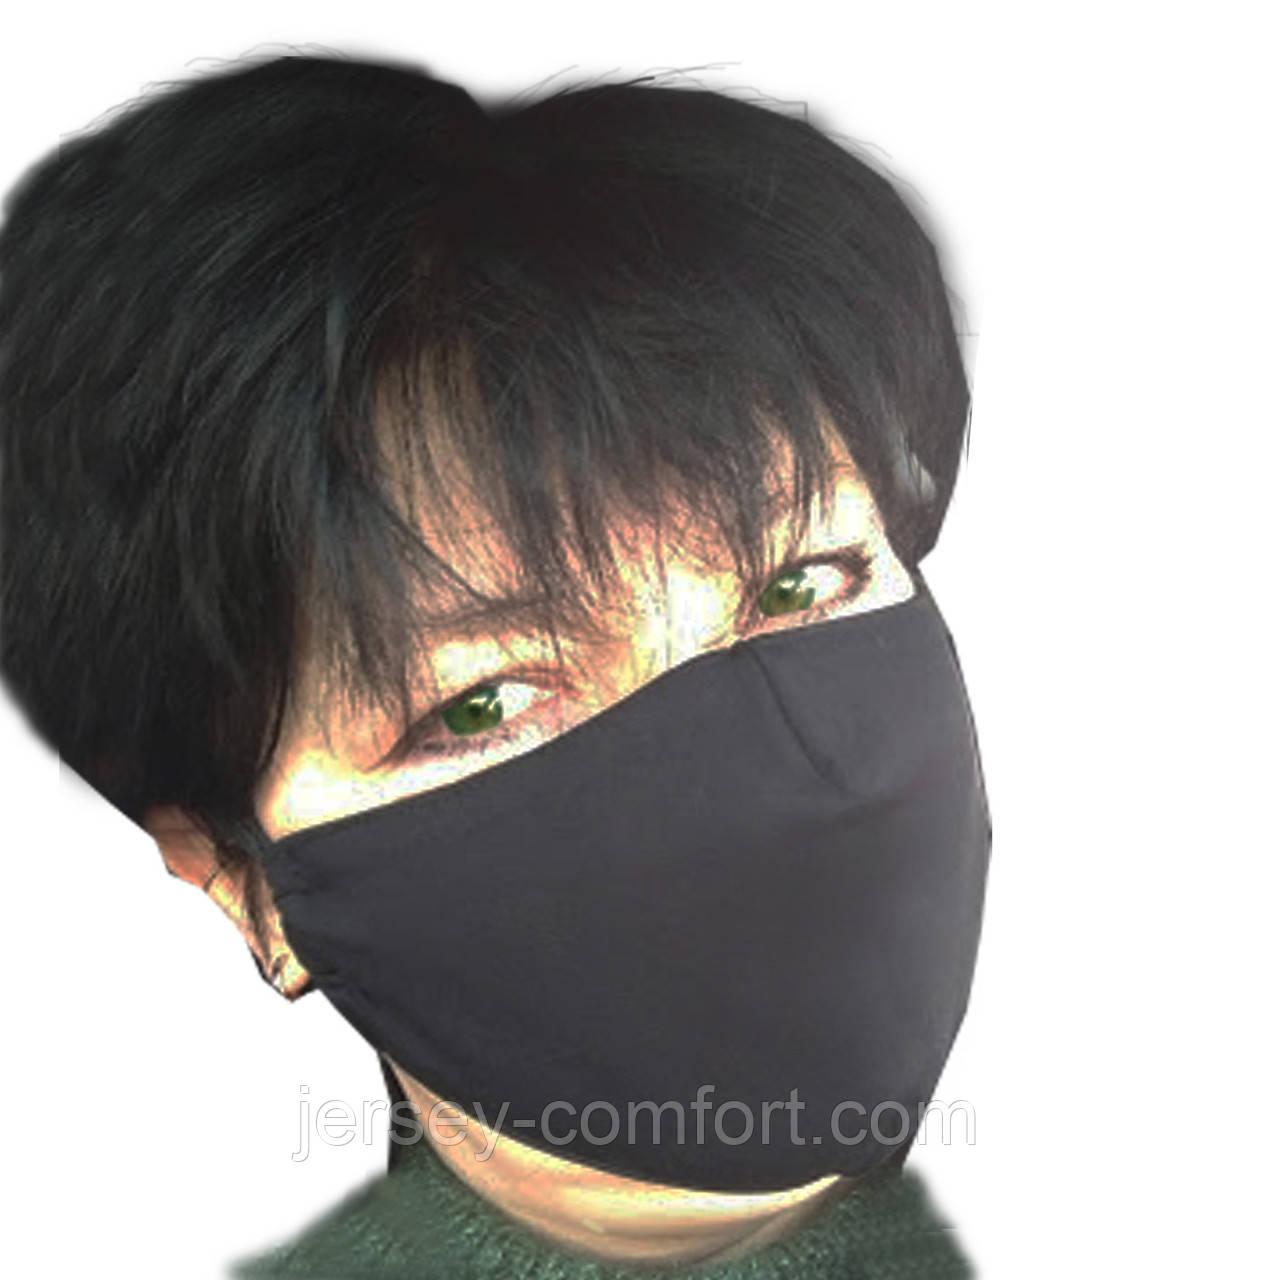 Маска защитная . Детская маска. Взрослая маска.Многоразовая маска.